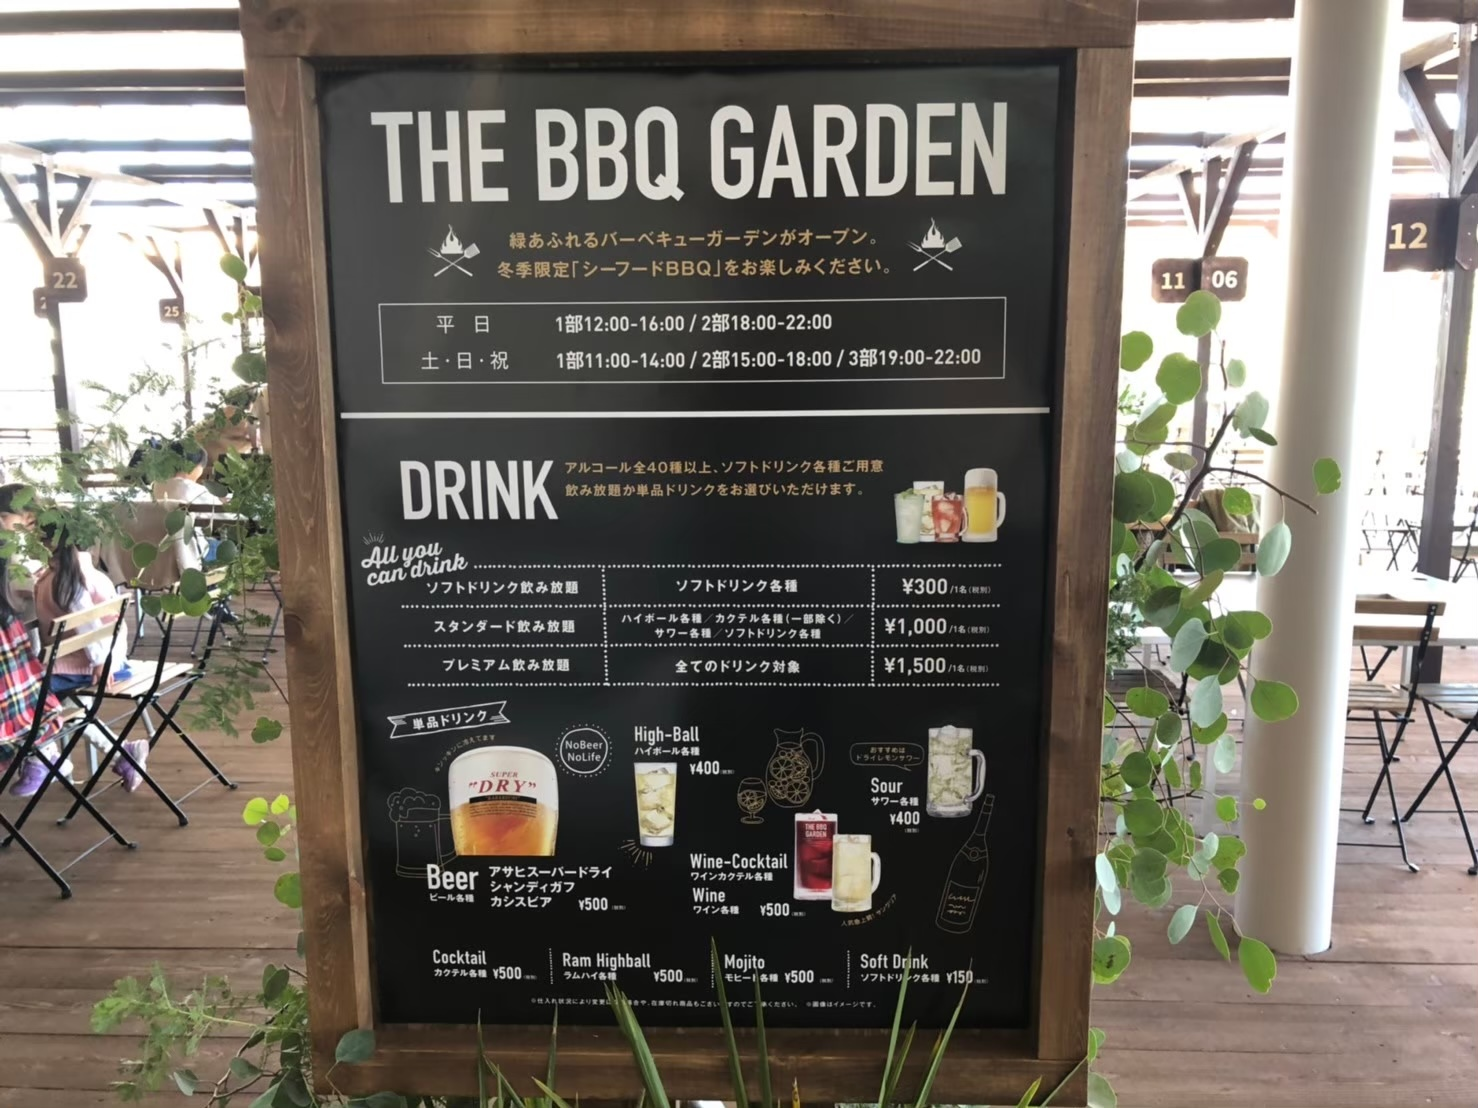 THE BBQ GARDEN in てんしば i:na(イーナ)